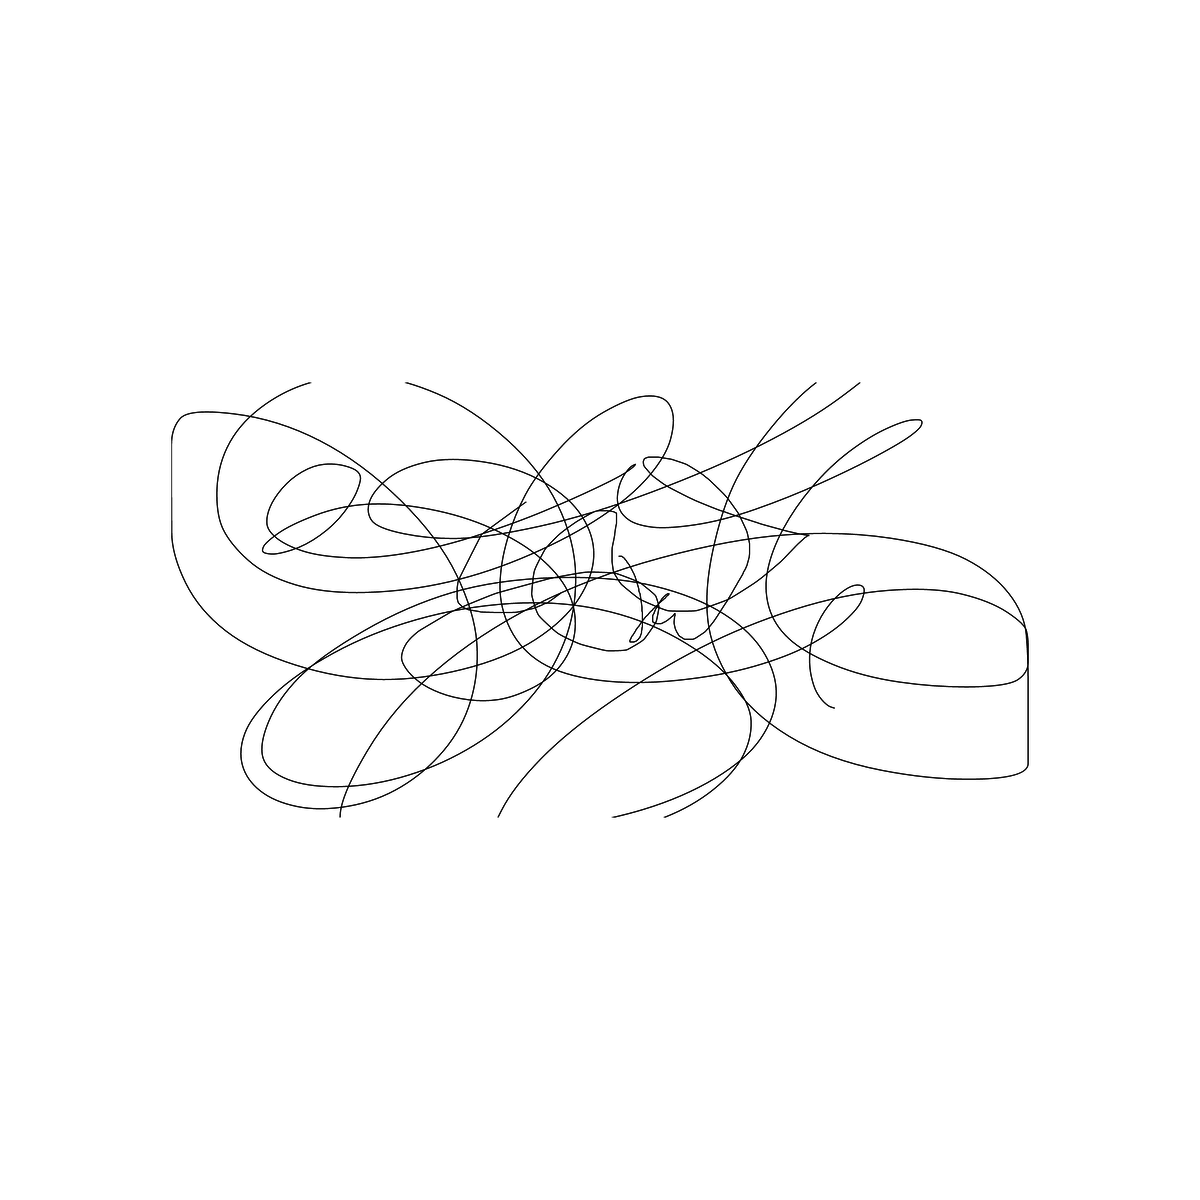 BAAAM drawing#22442 lat:45.9545898437500000lng: -73.6411285400390600